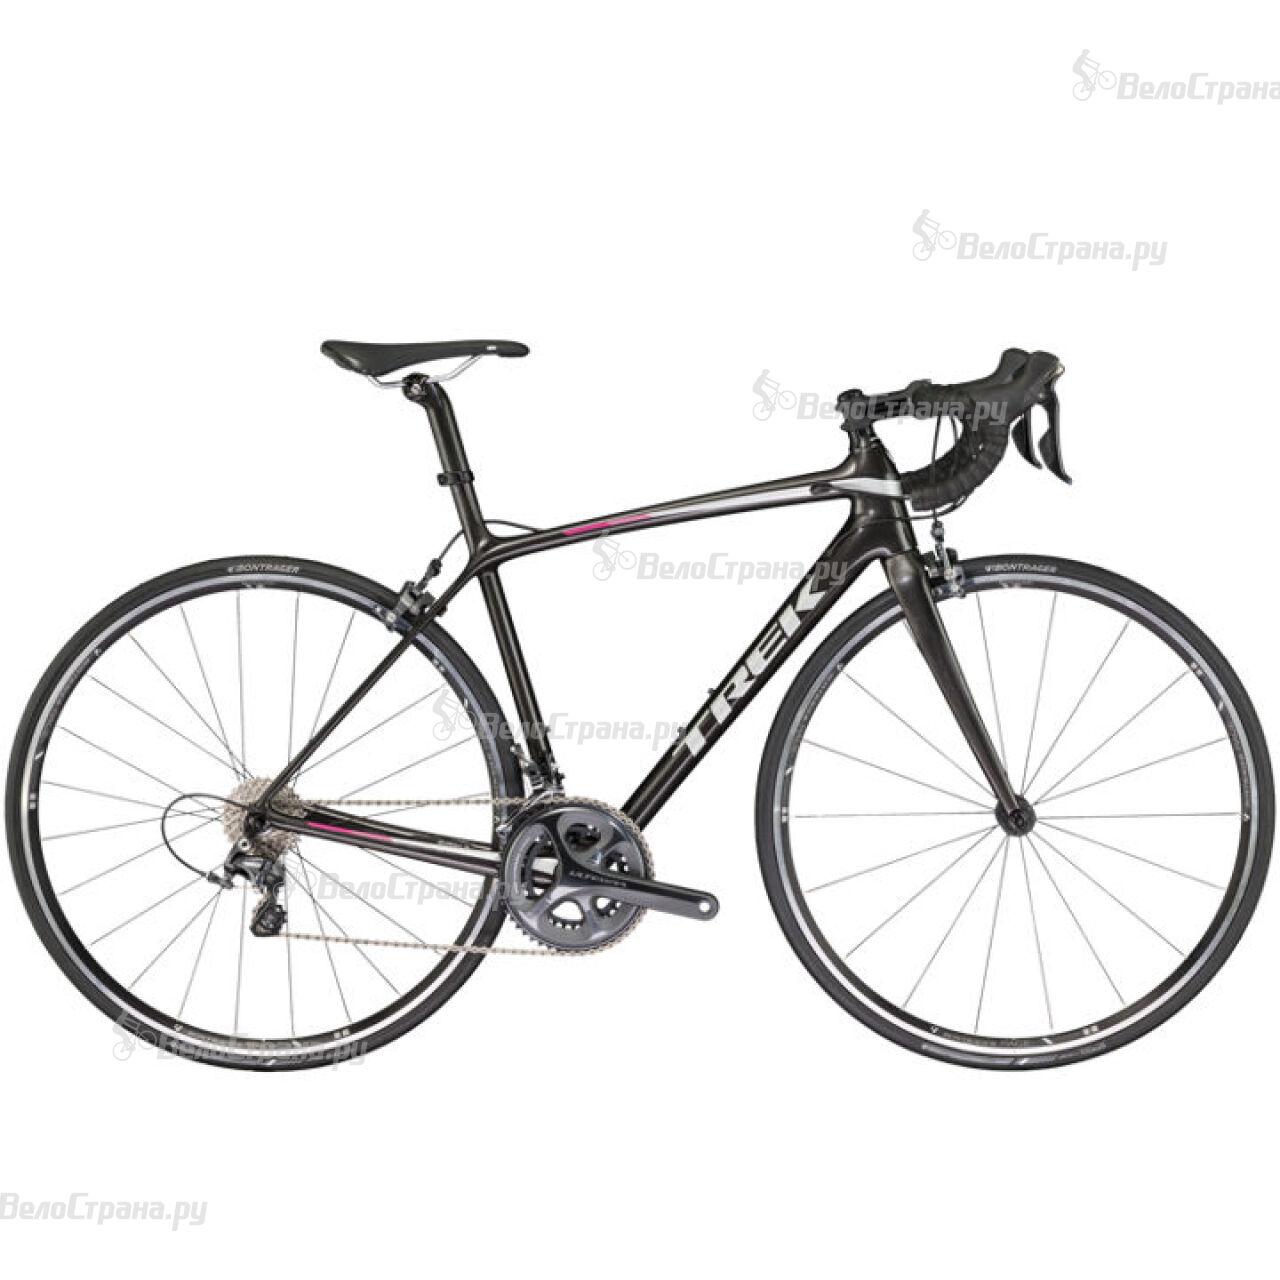 Велосипед Trek Emonda SL 6 WSD (2017) велосипед trek madone 3 1 wsd 2013